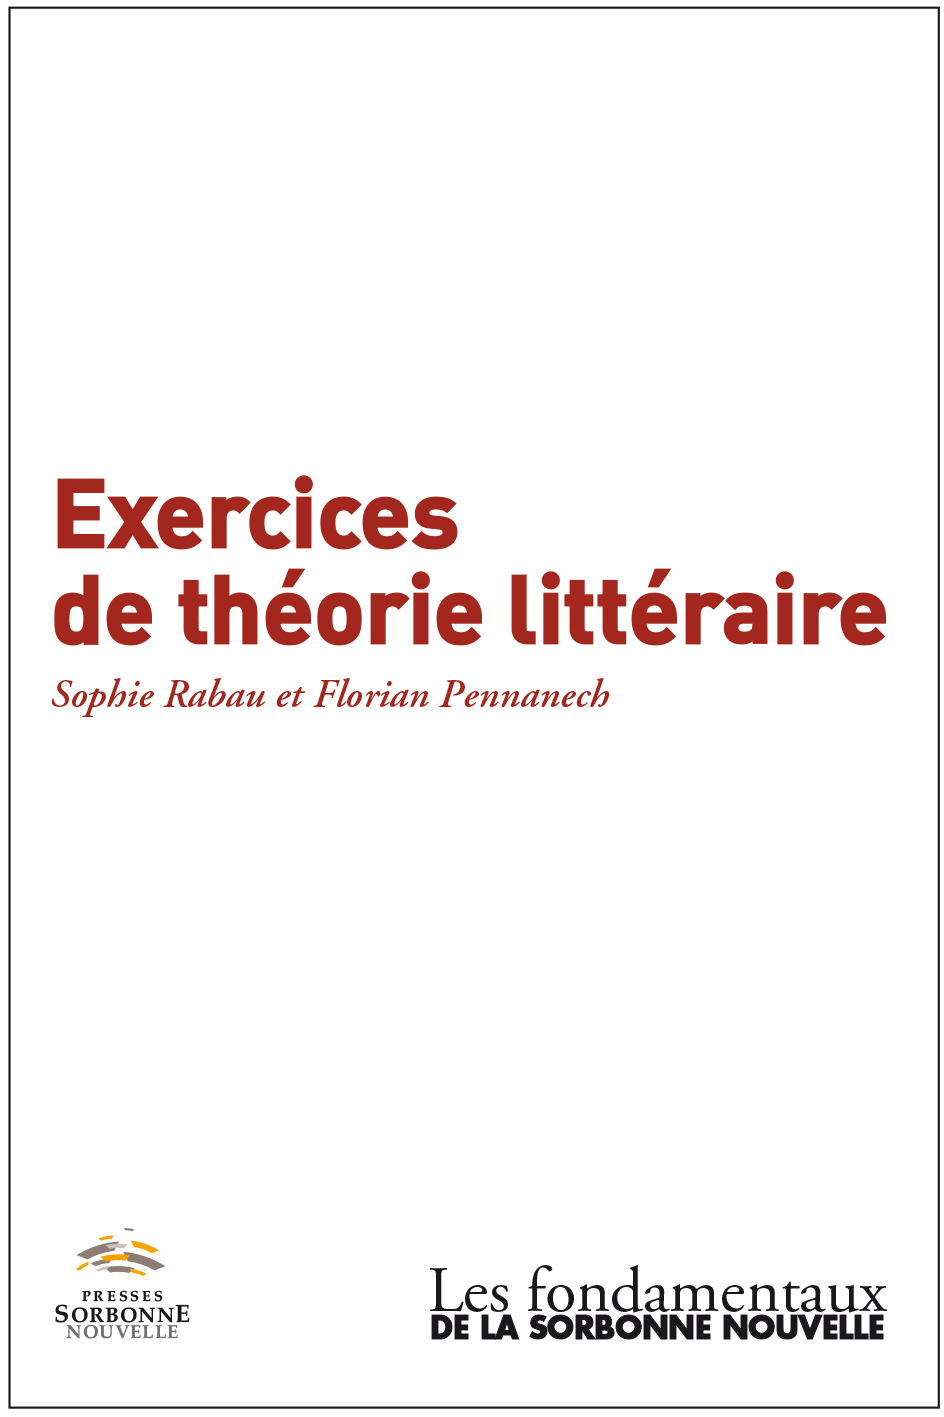 S. Rabau, F. Pennanech, Exercices de théorie littéraire